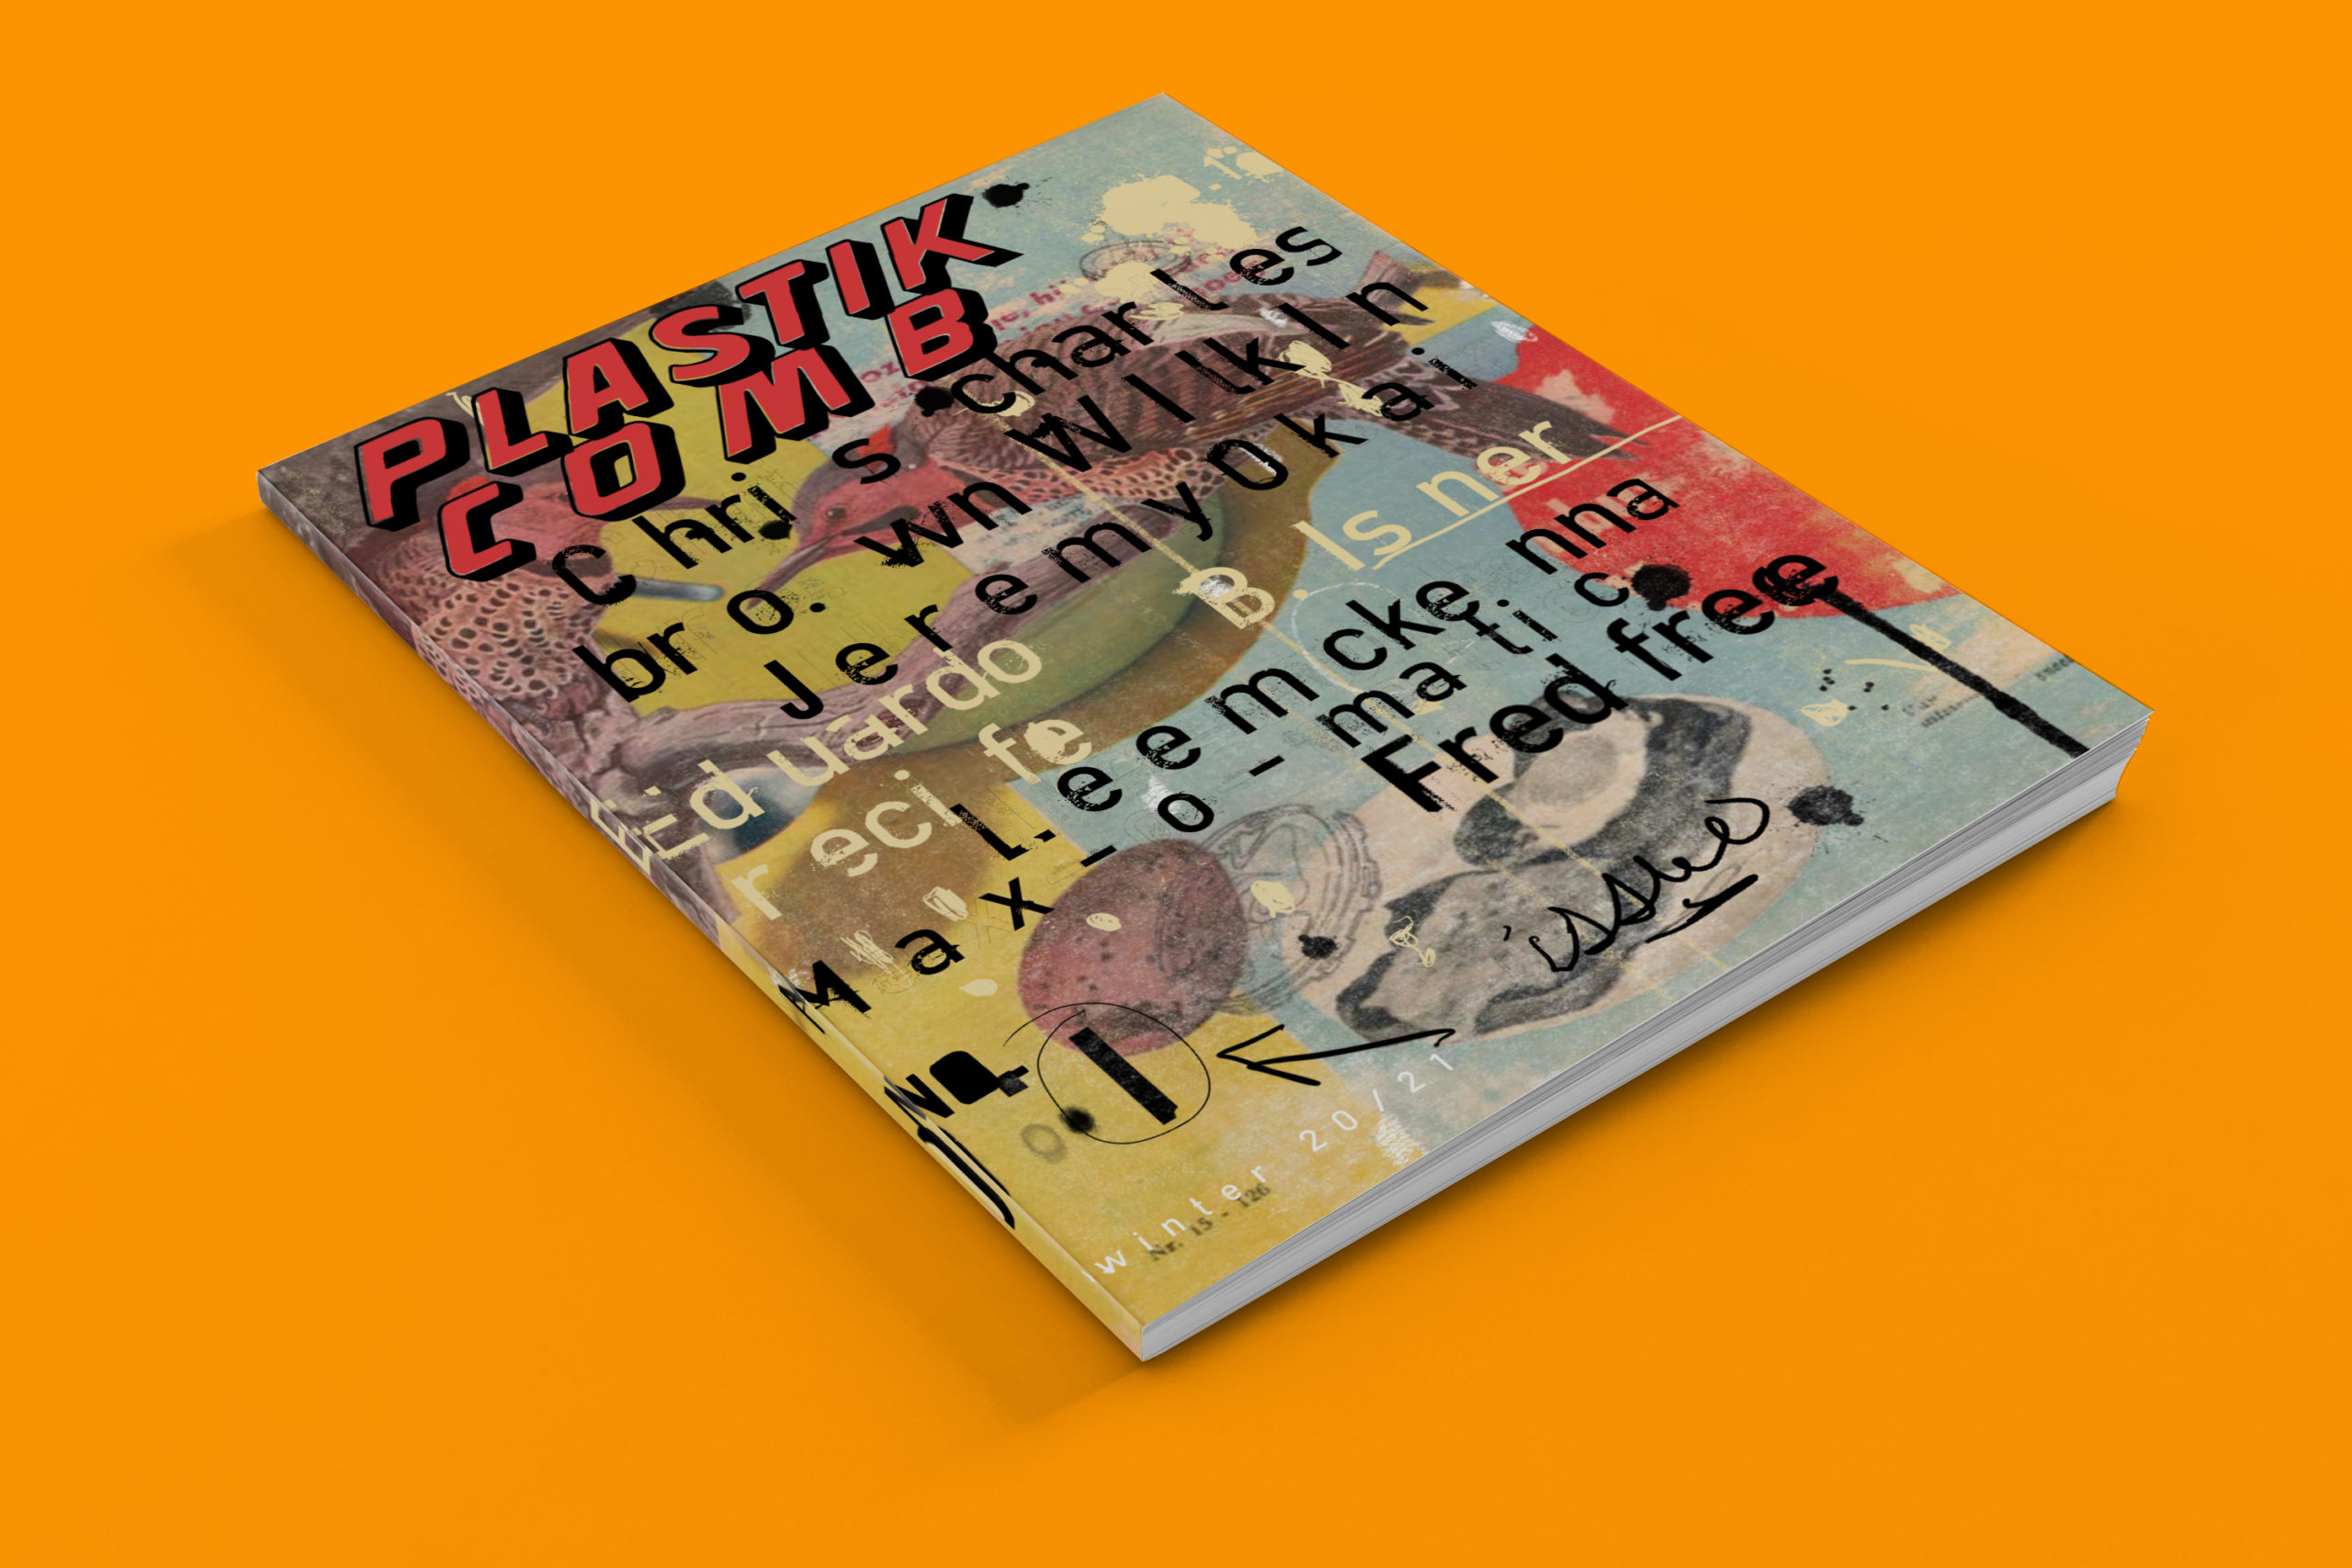 PLASTIKCOMB MAGAZINE 1.0